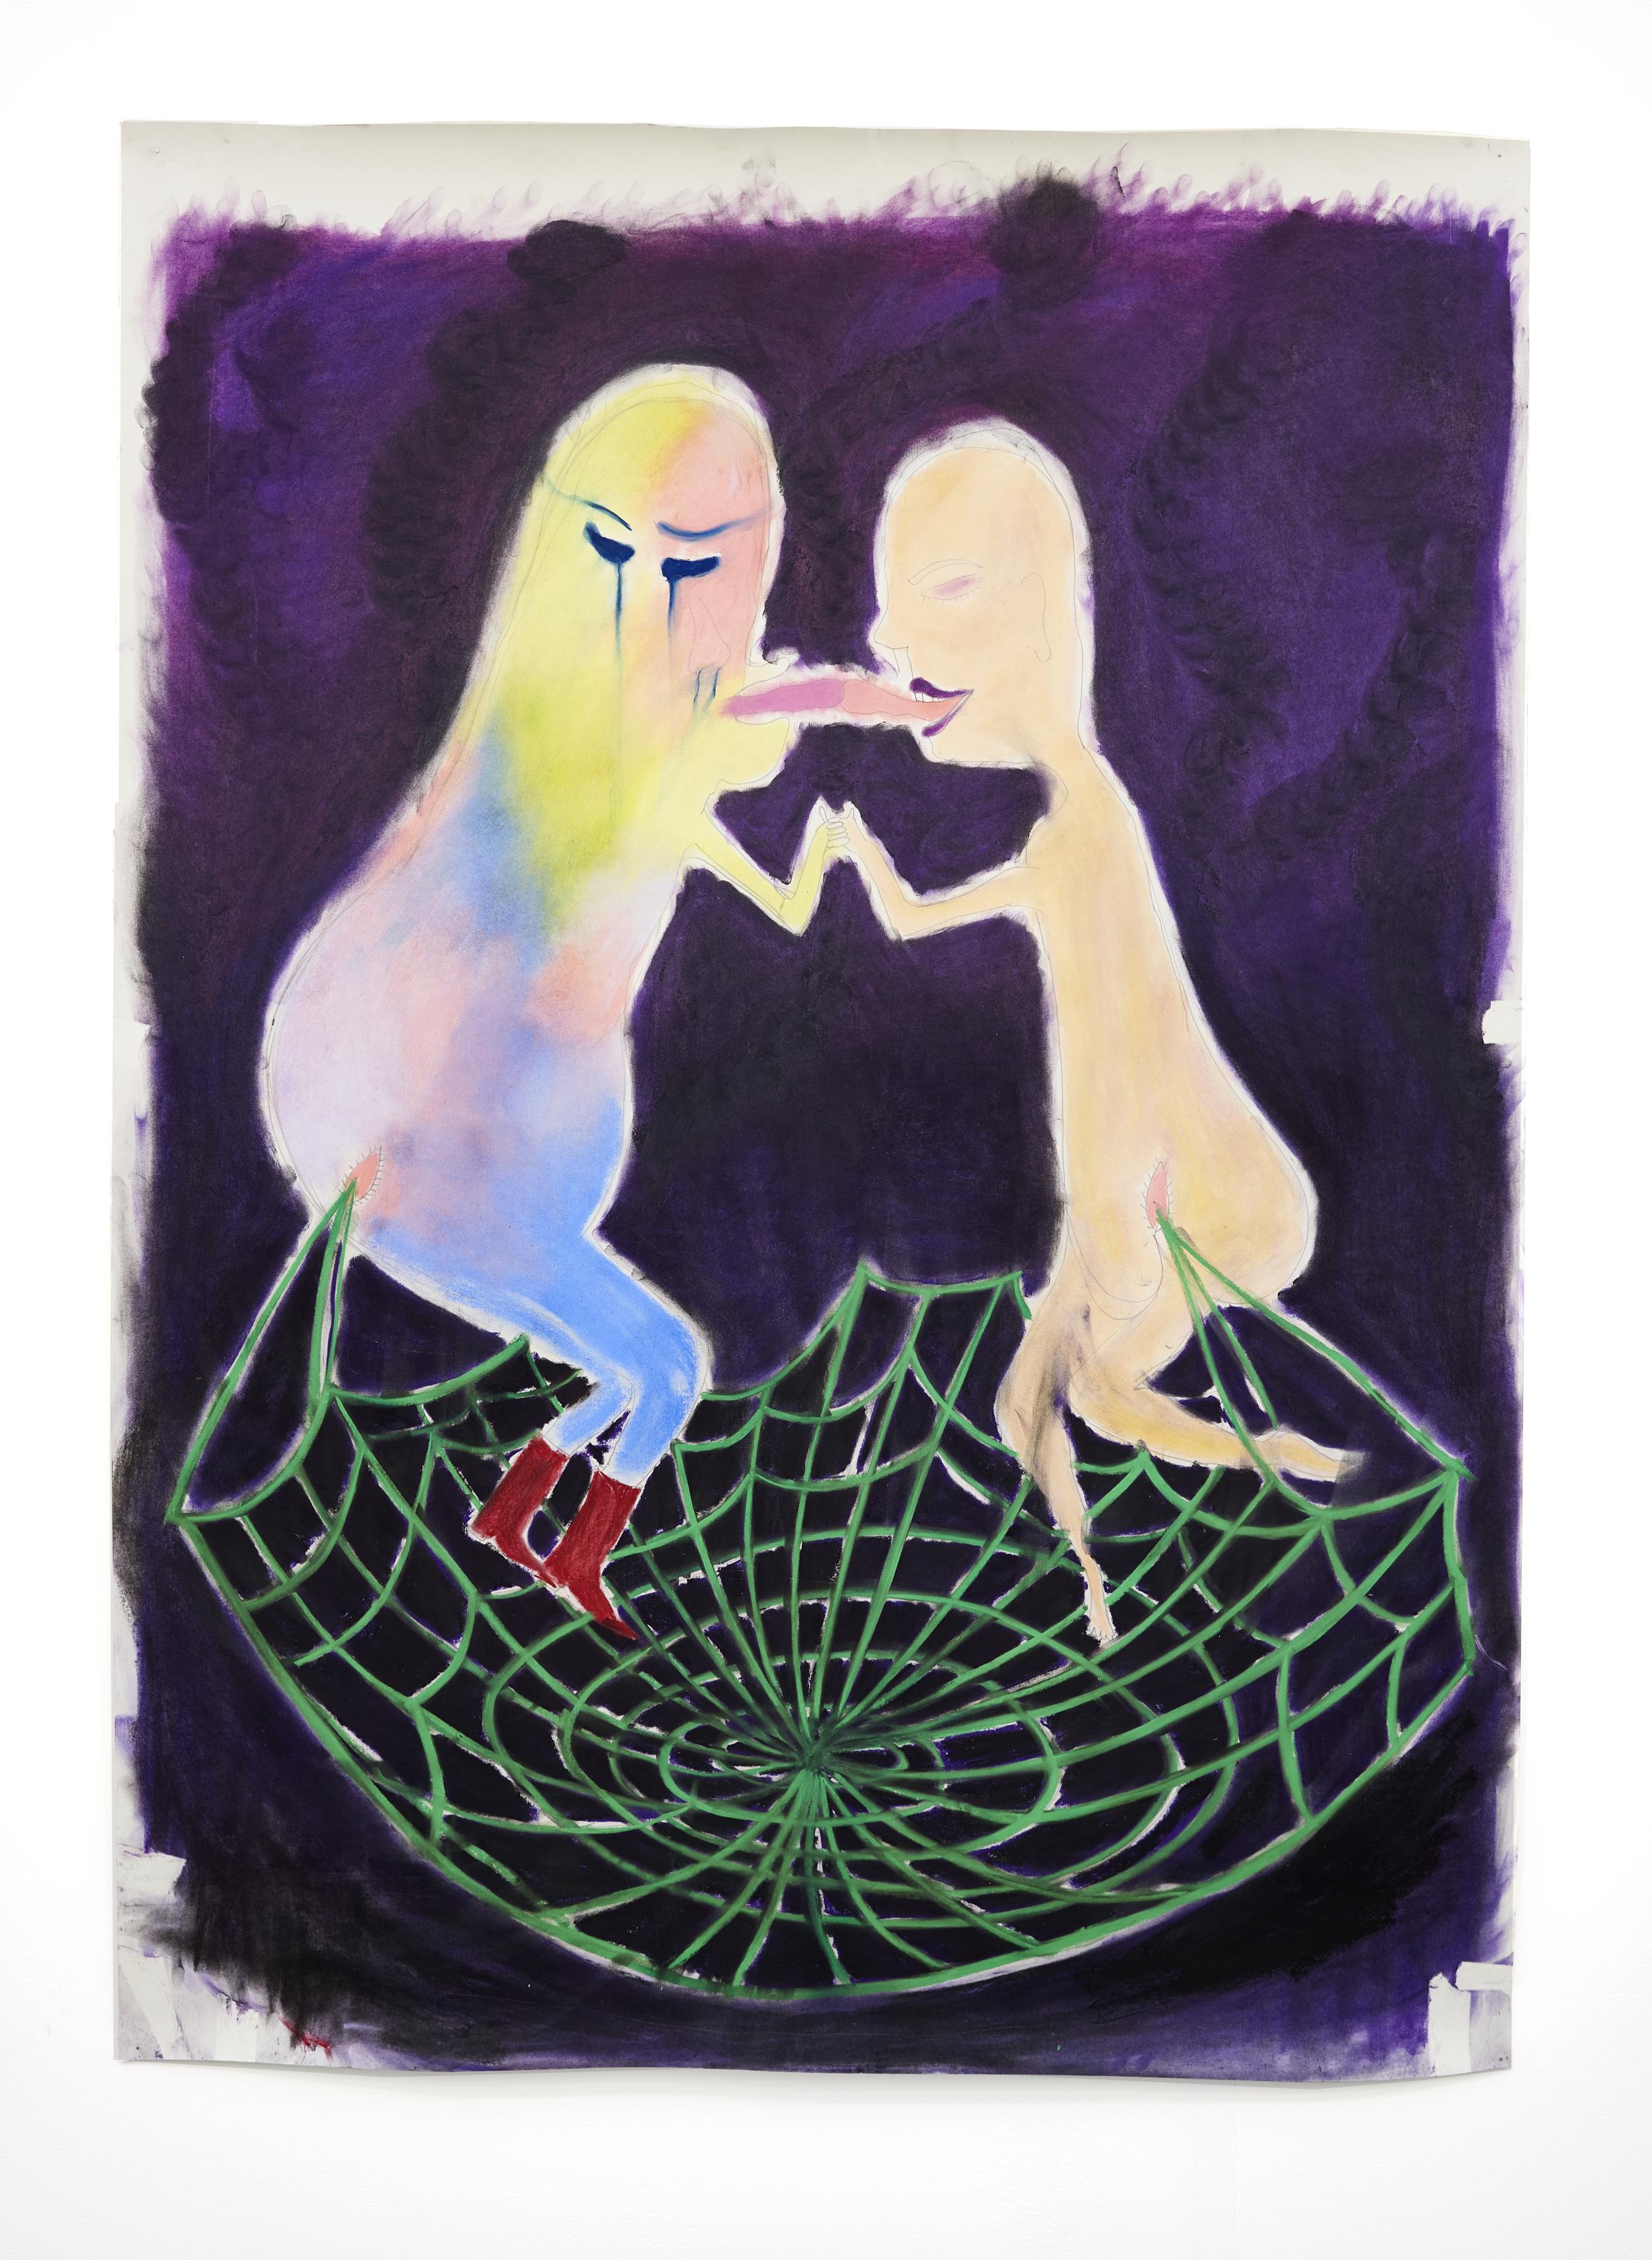 Nicanor Araoz. <em>Untitled</em>, 2017. Soft pastels on paper, 67 x 48 inches  (170.2 x 121.9 cm)